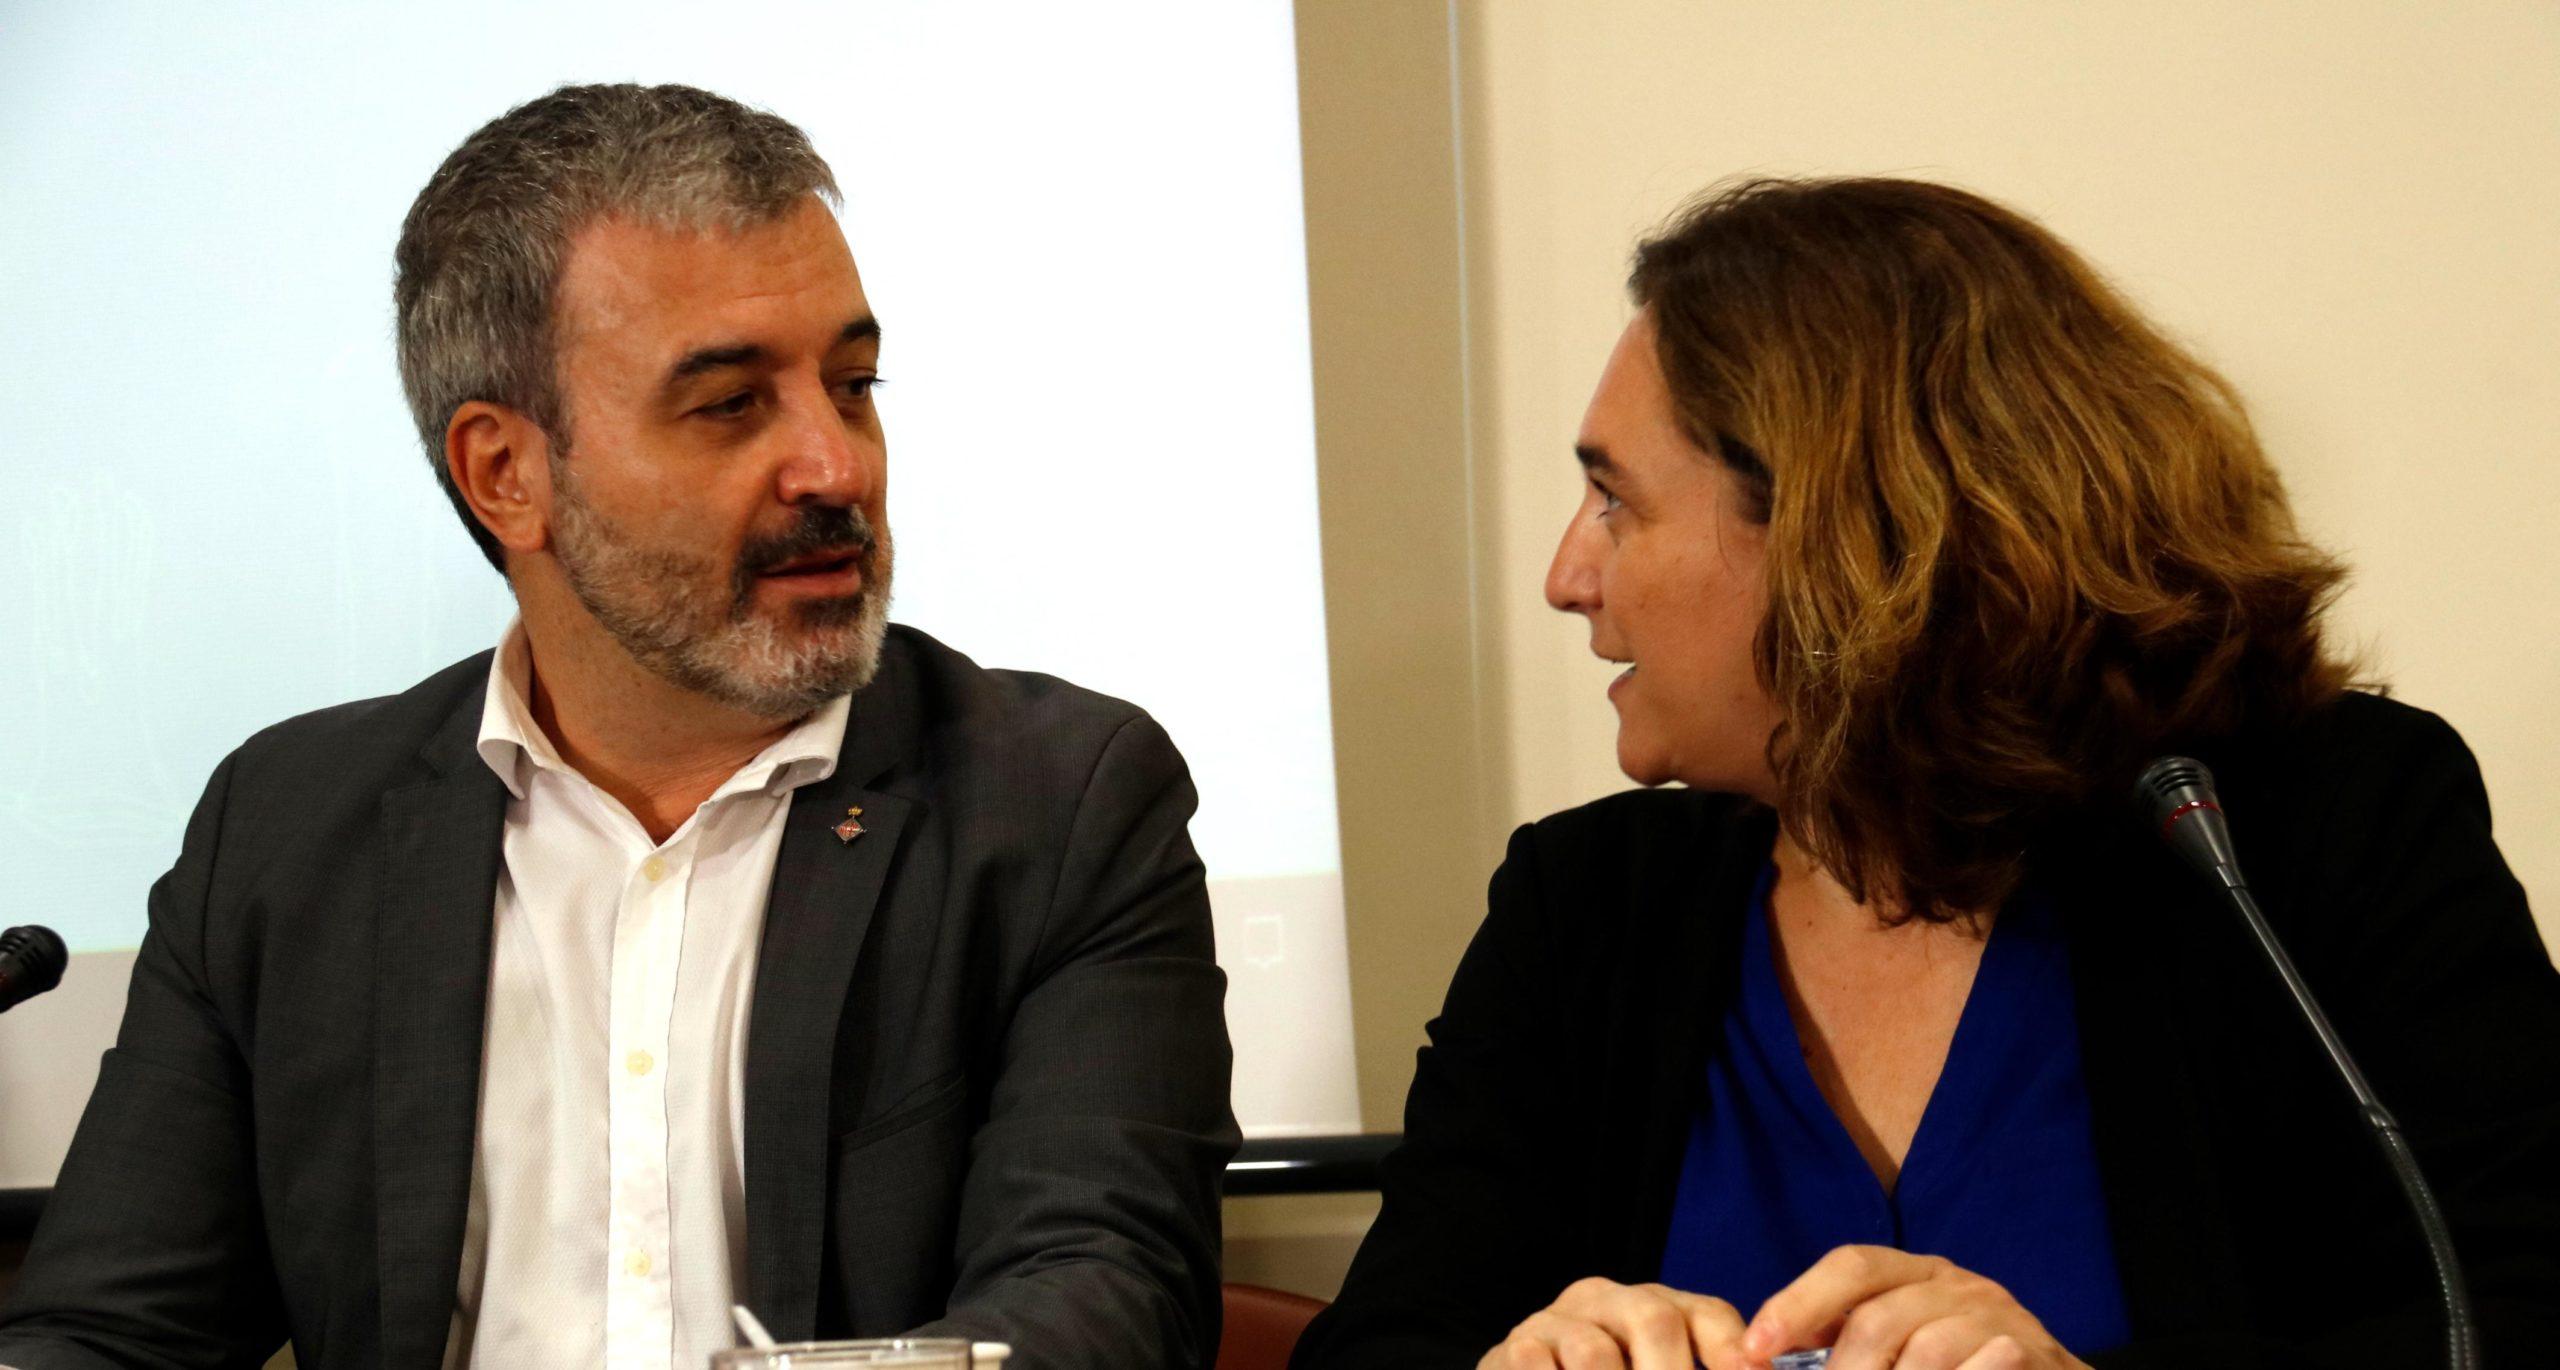 Ada Colau i Jaume Collboni, en una imatge d'arxiu / ACN (Blanca Blay)